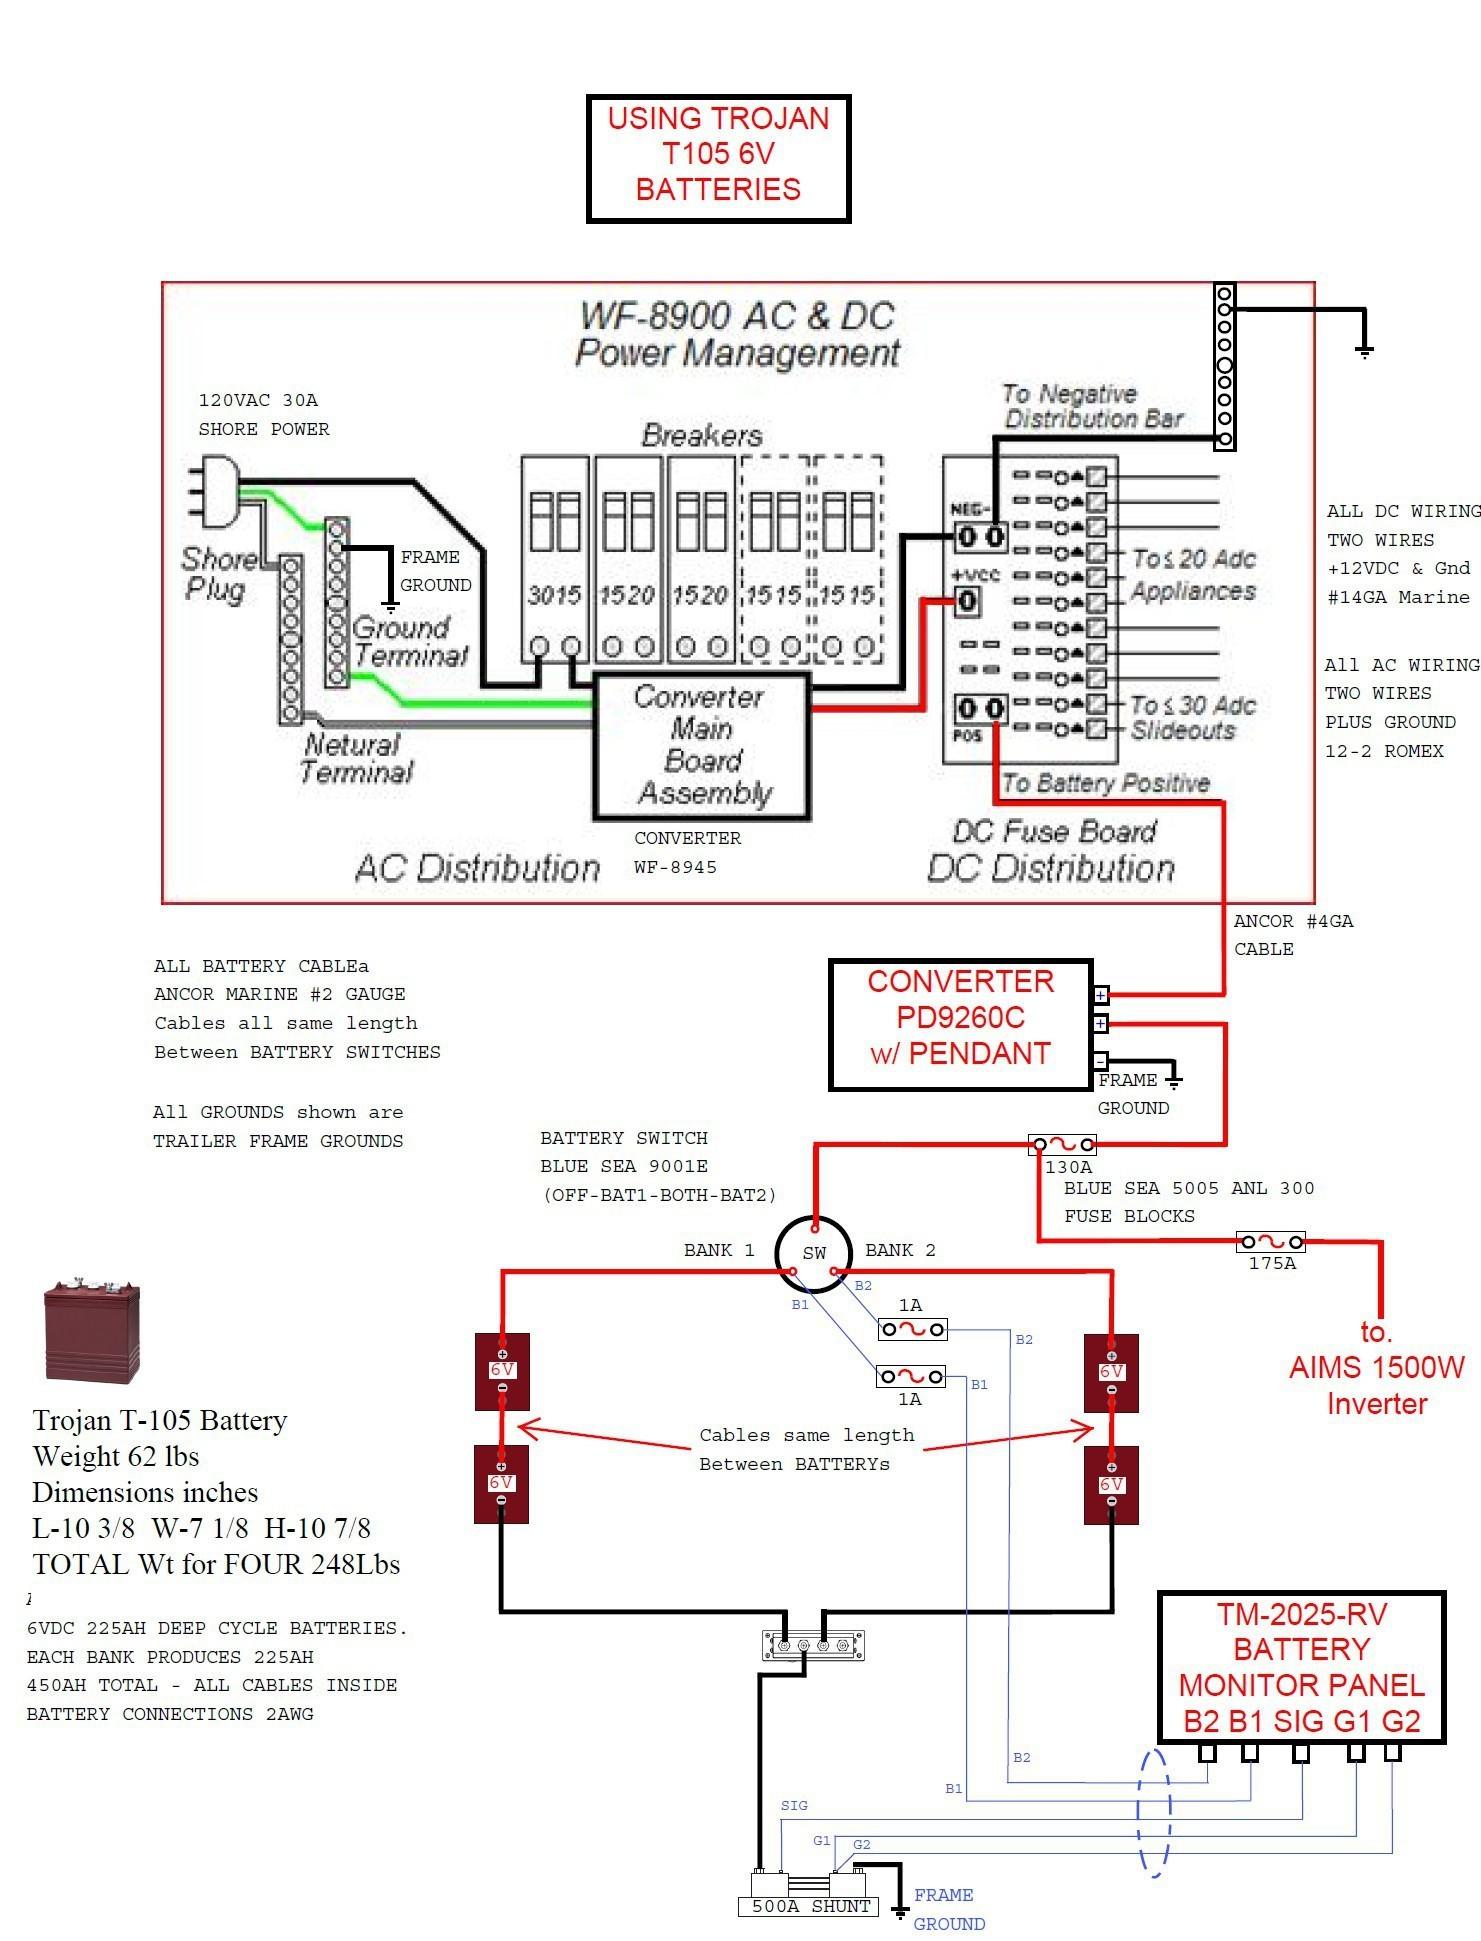 Kib K21 System Monitor Owners Manual Kib Rv Monitor Panel Wiring Diagram Wiring Diagram Schematic